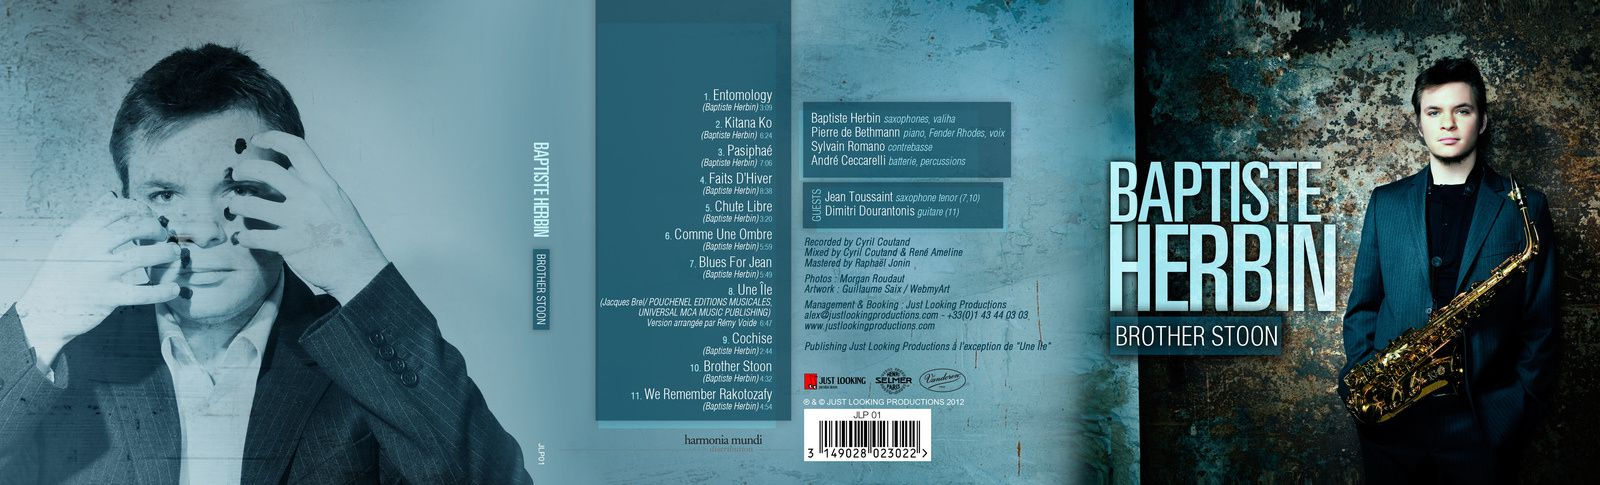 artwork albums Baptiste Herbin